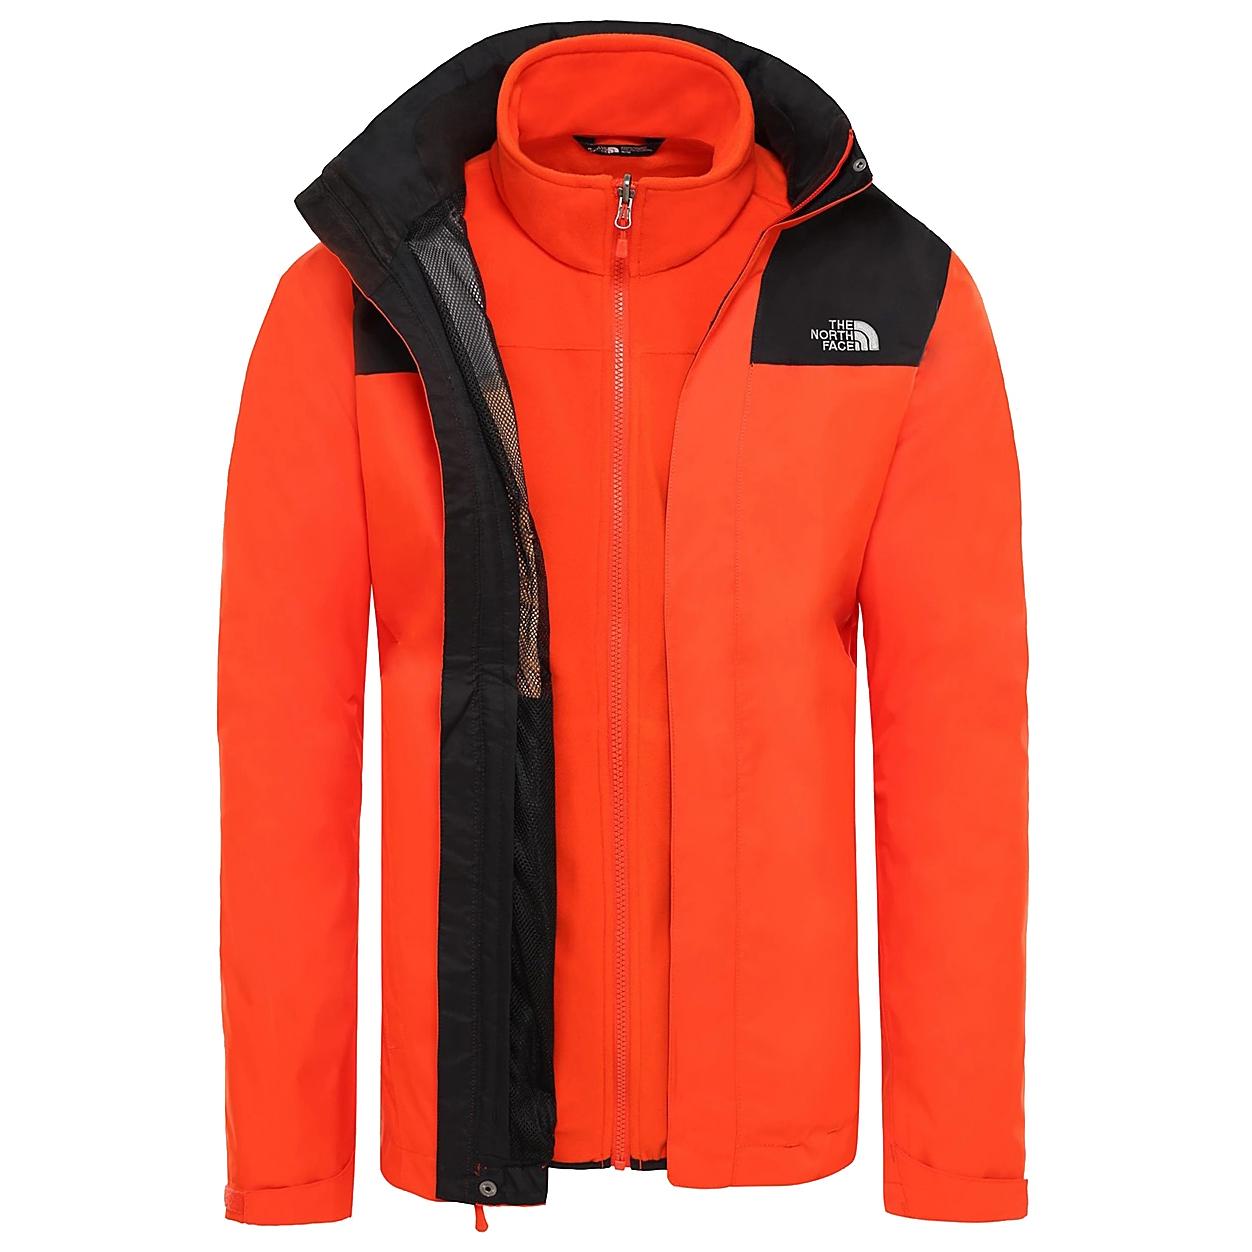 f7e98aff The North Face Evolve II Triclimate Jacket - 3 i 1-jakke Herre ...